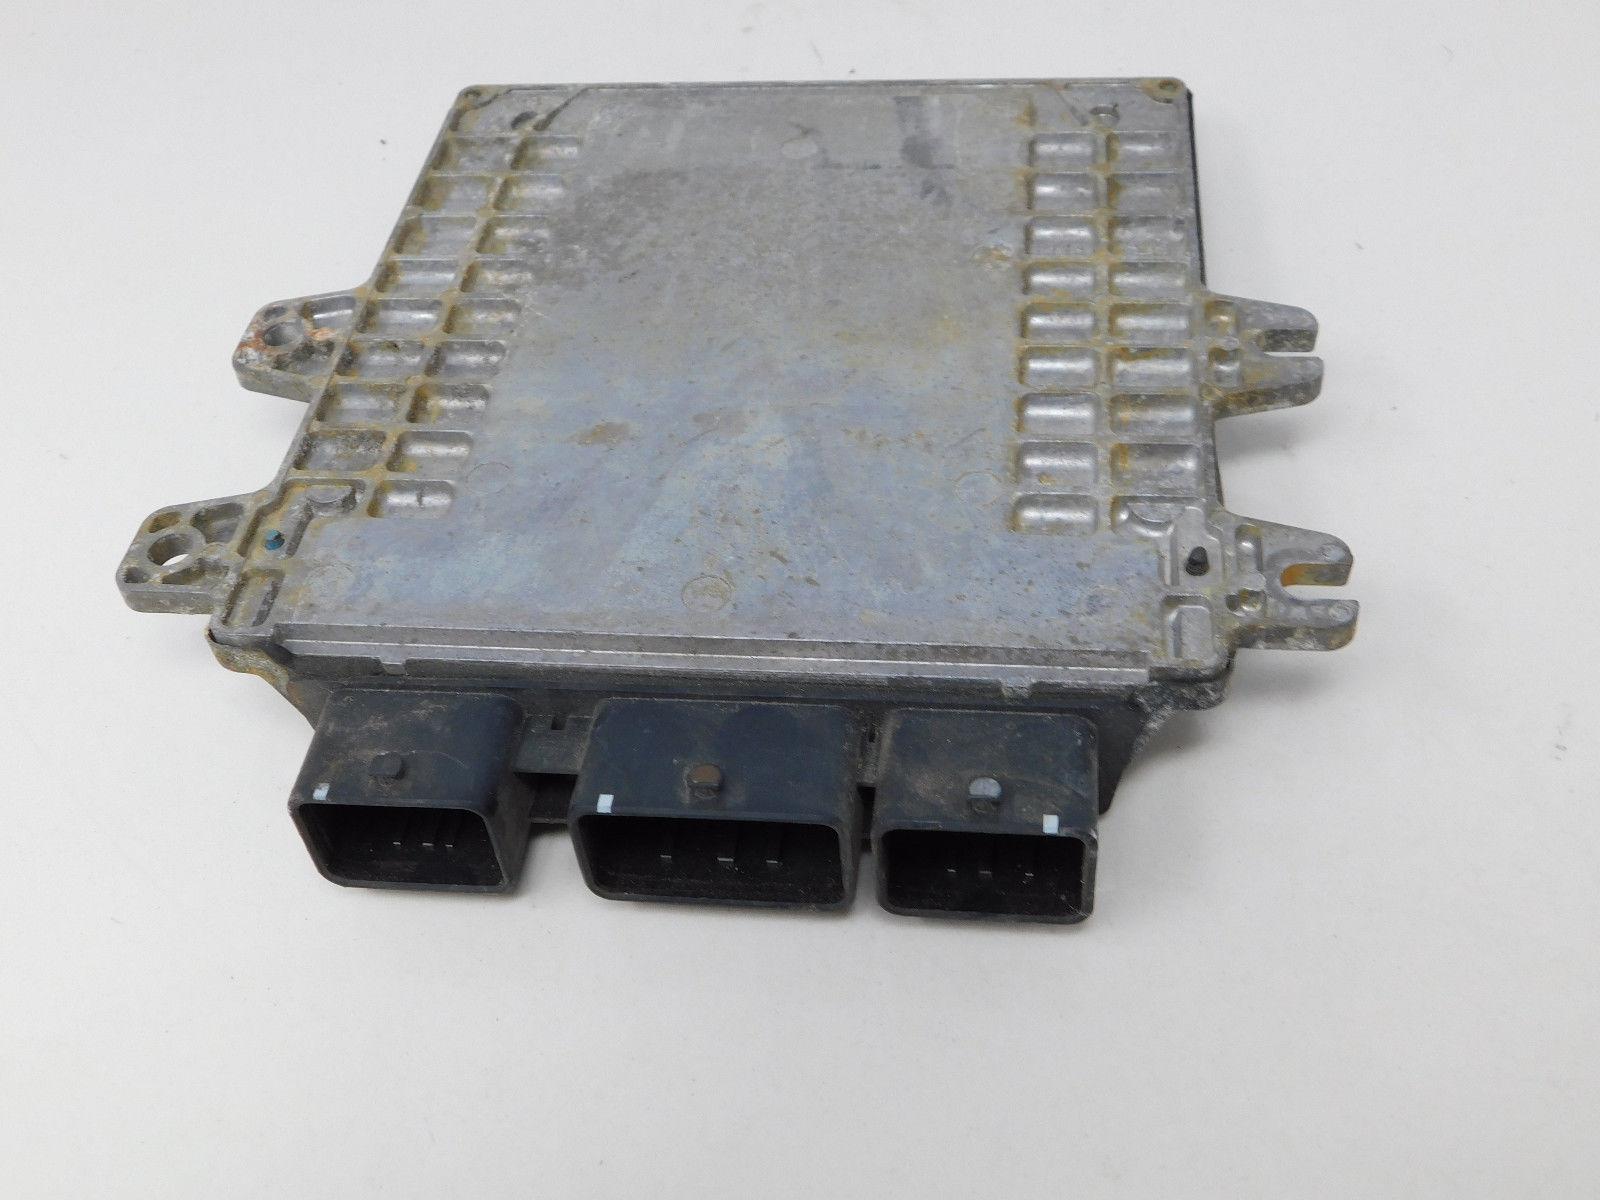 2007 Nissan Altima 3 5 SL Engine Control and 50 similar items